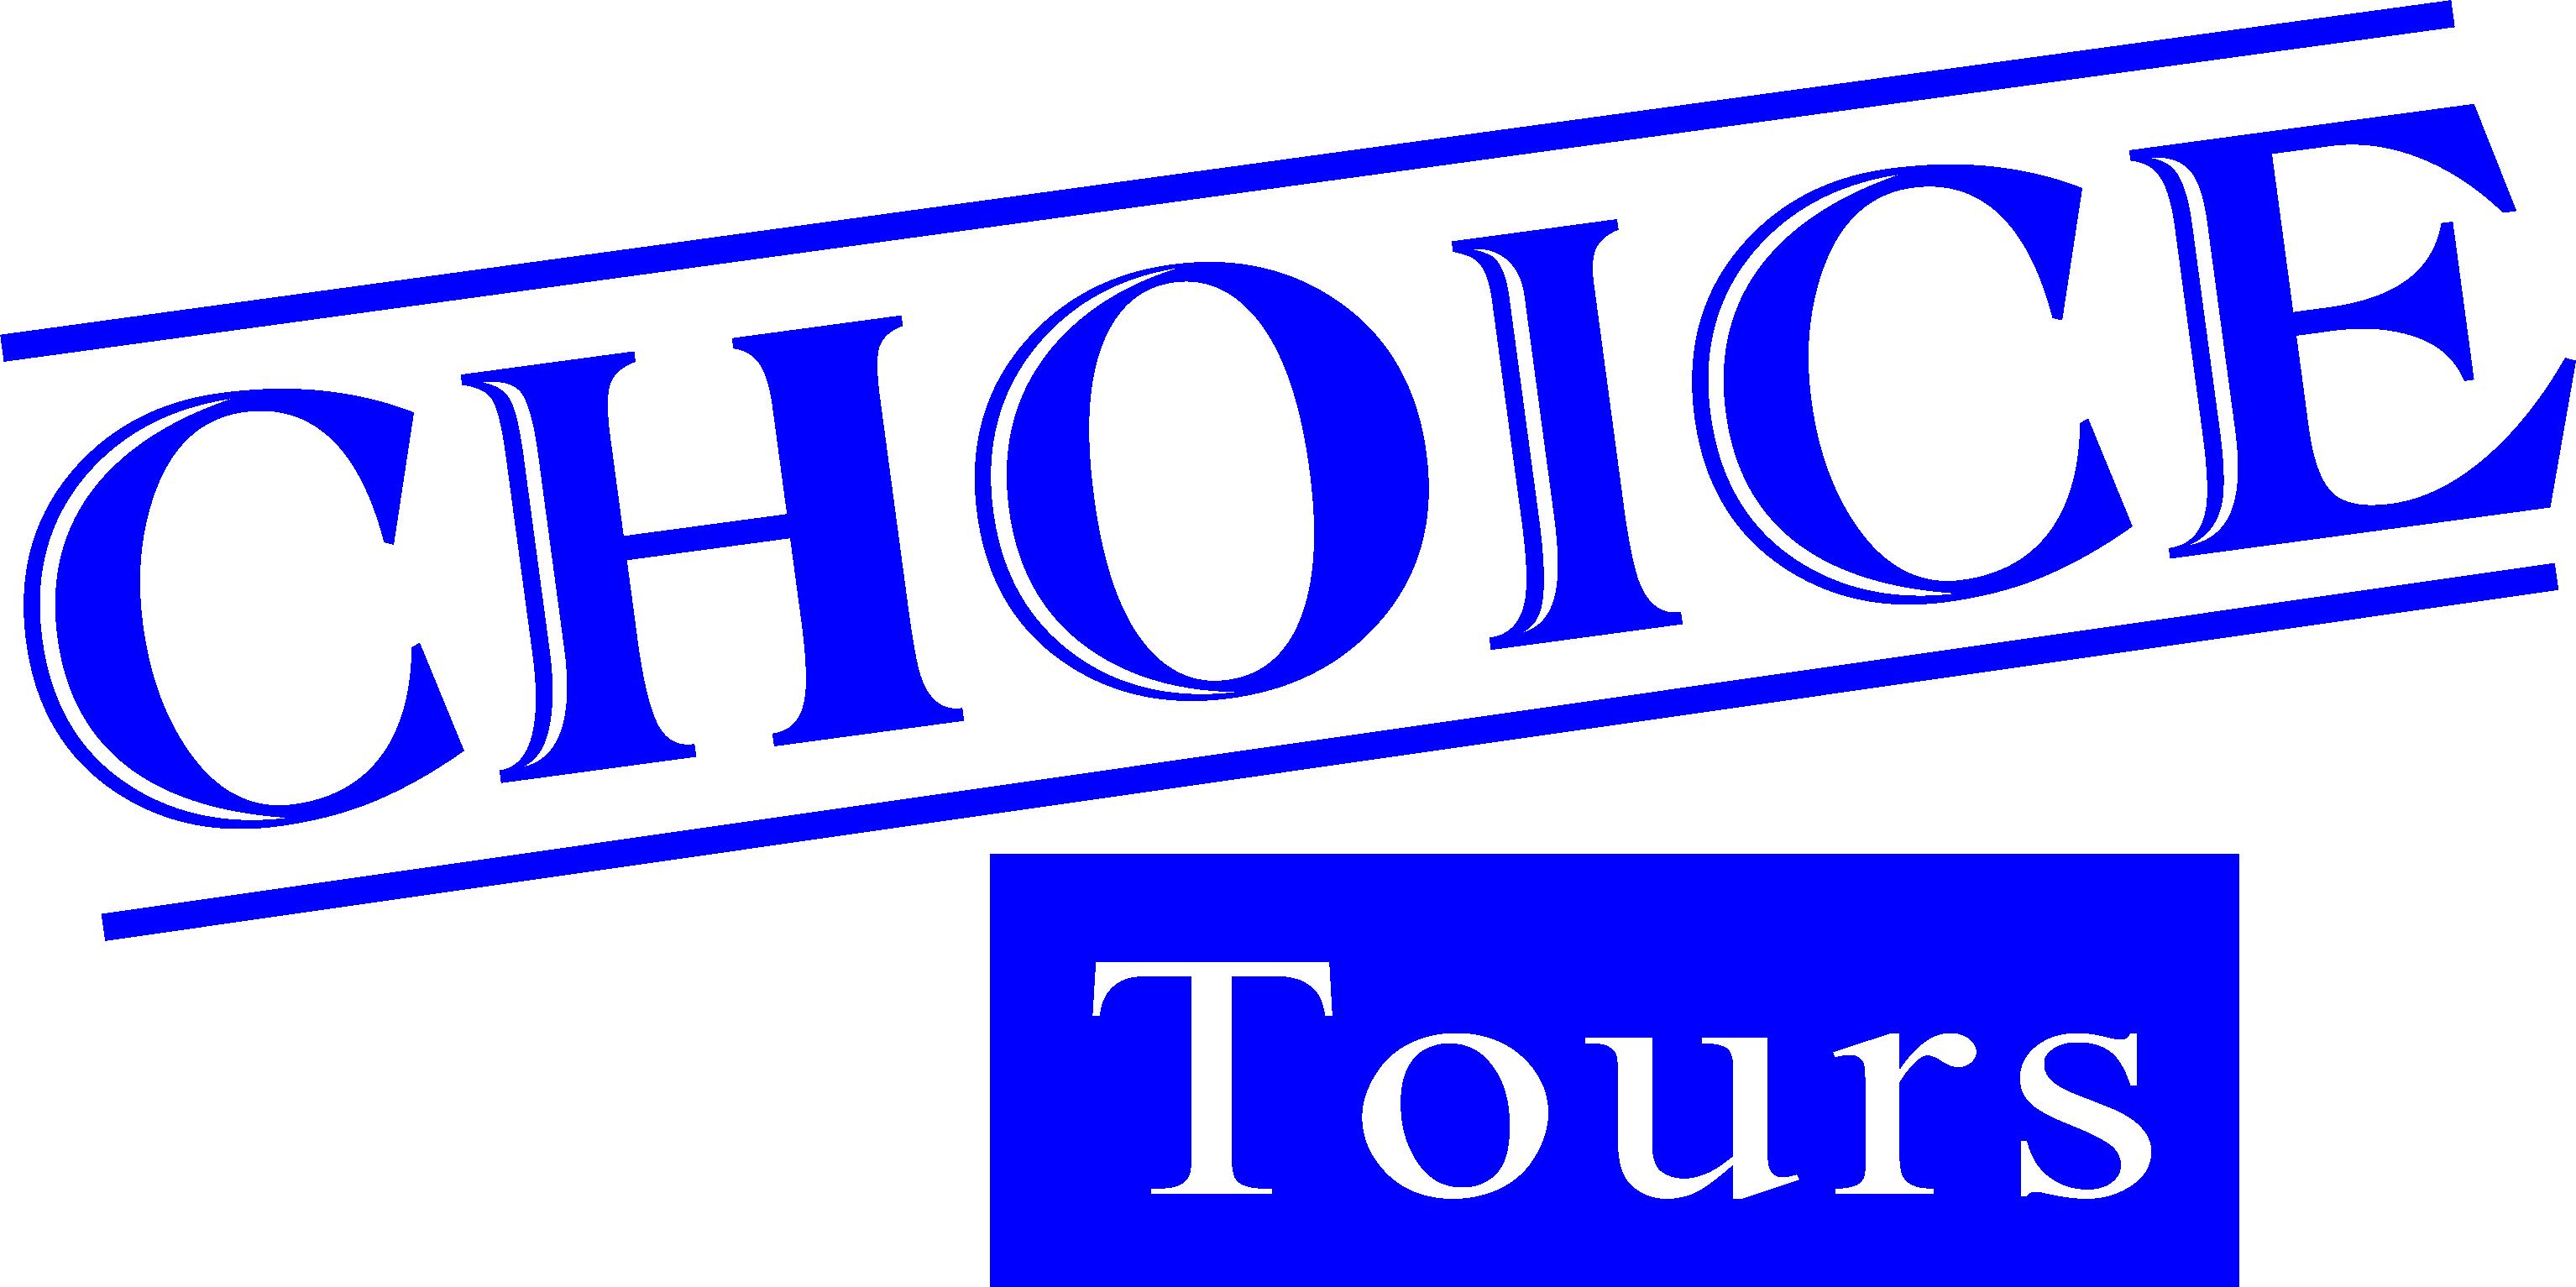 Choice Tours